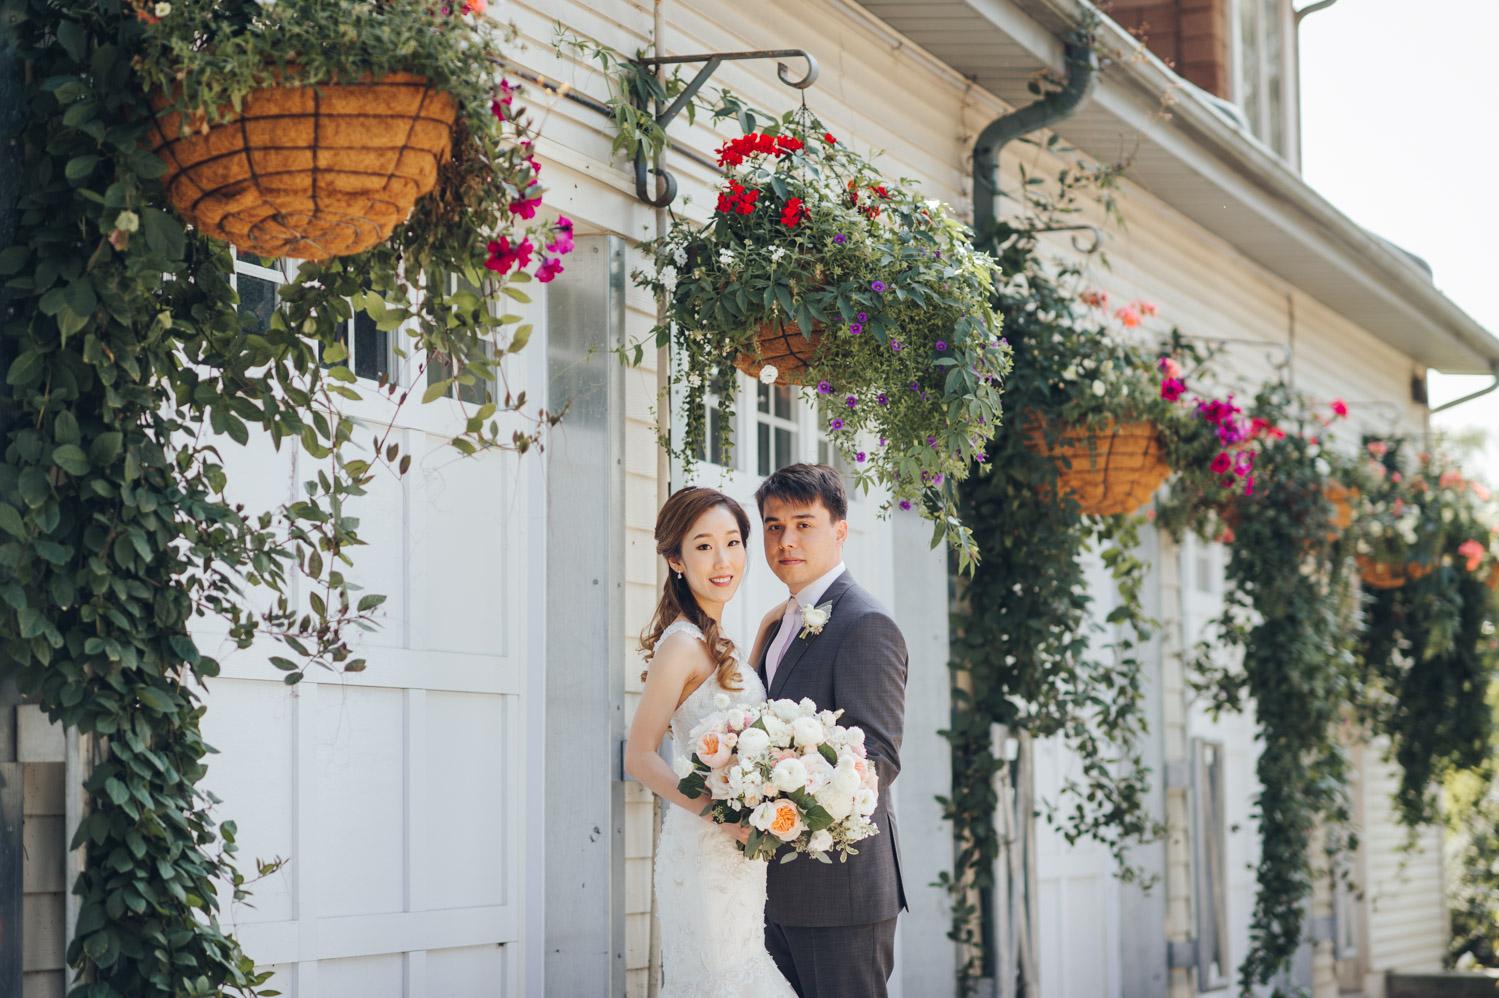 Portraits at Edwards Garden Wedding Photography